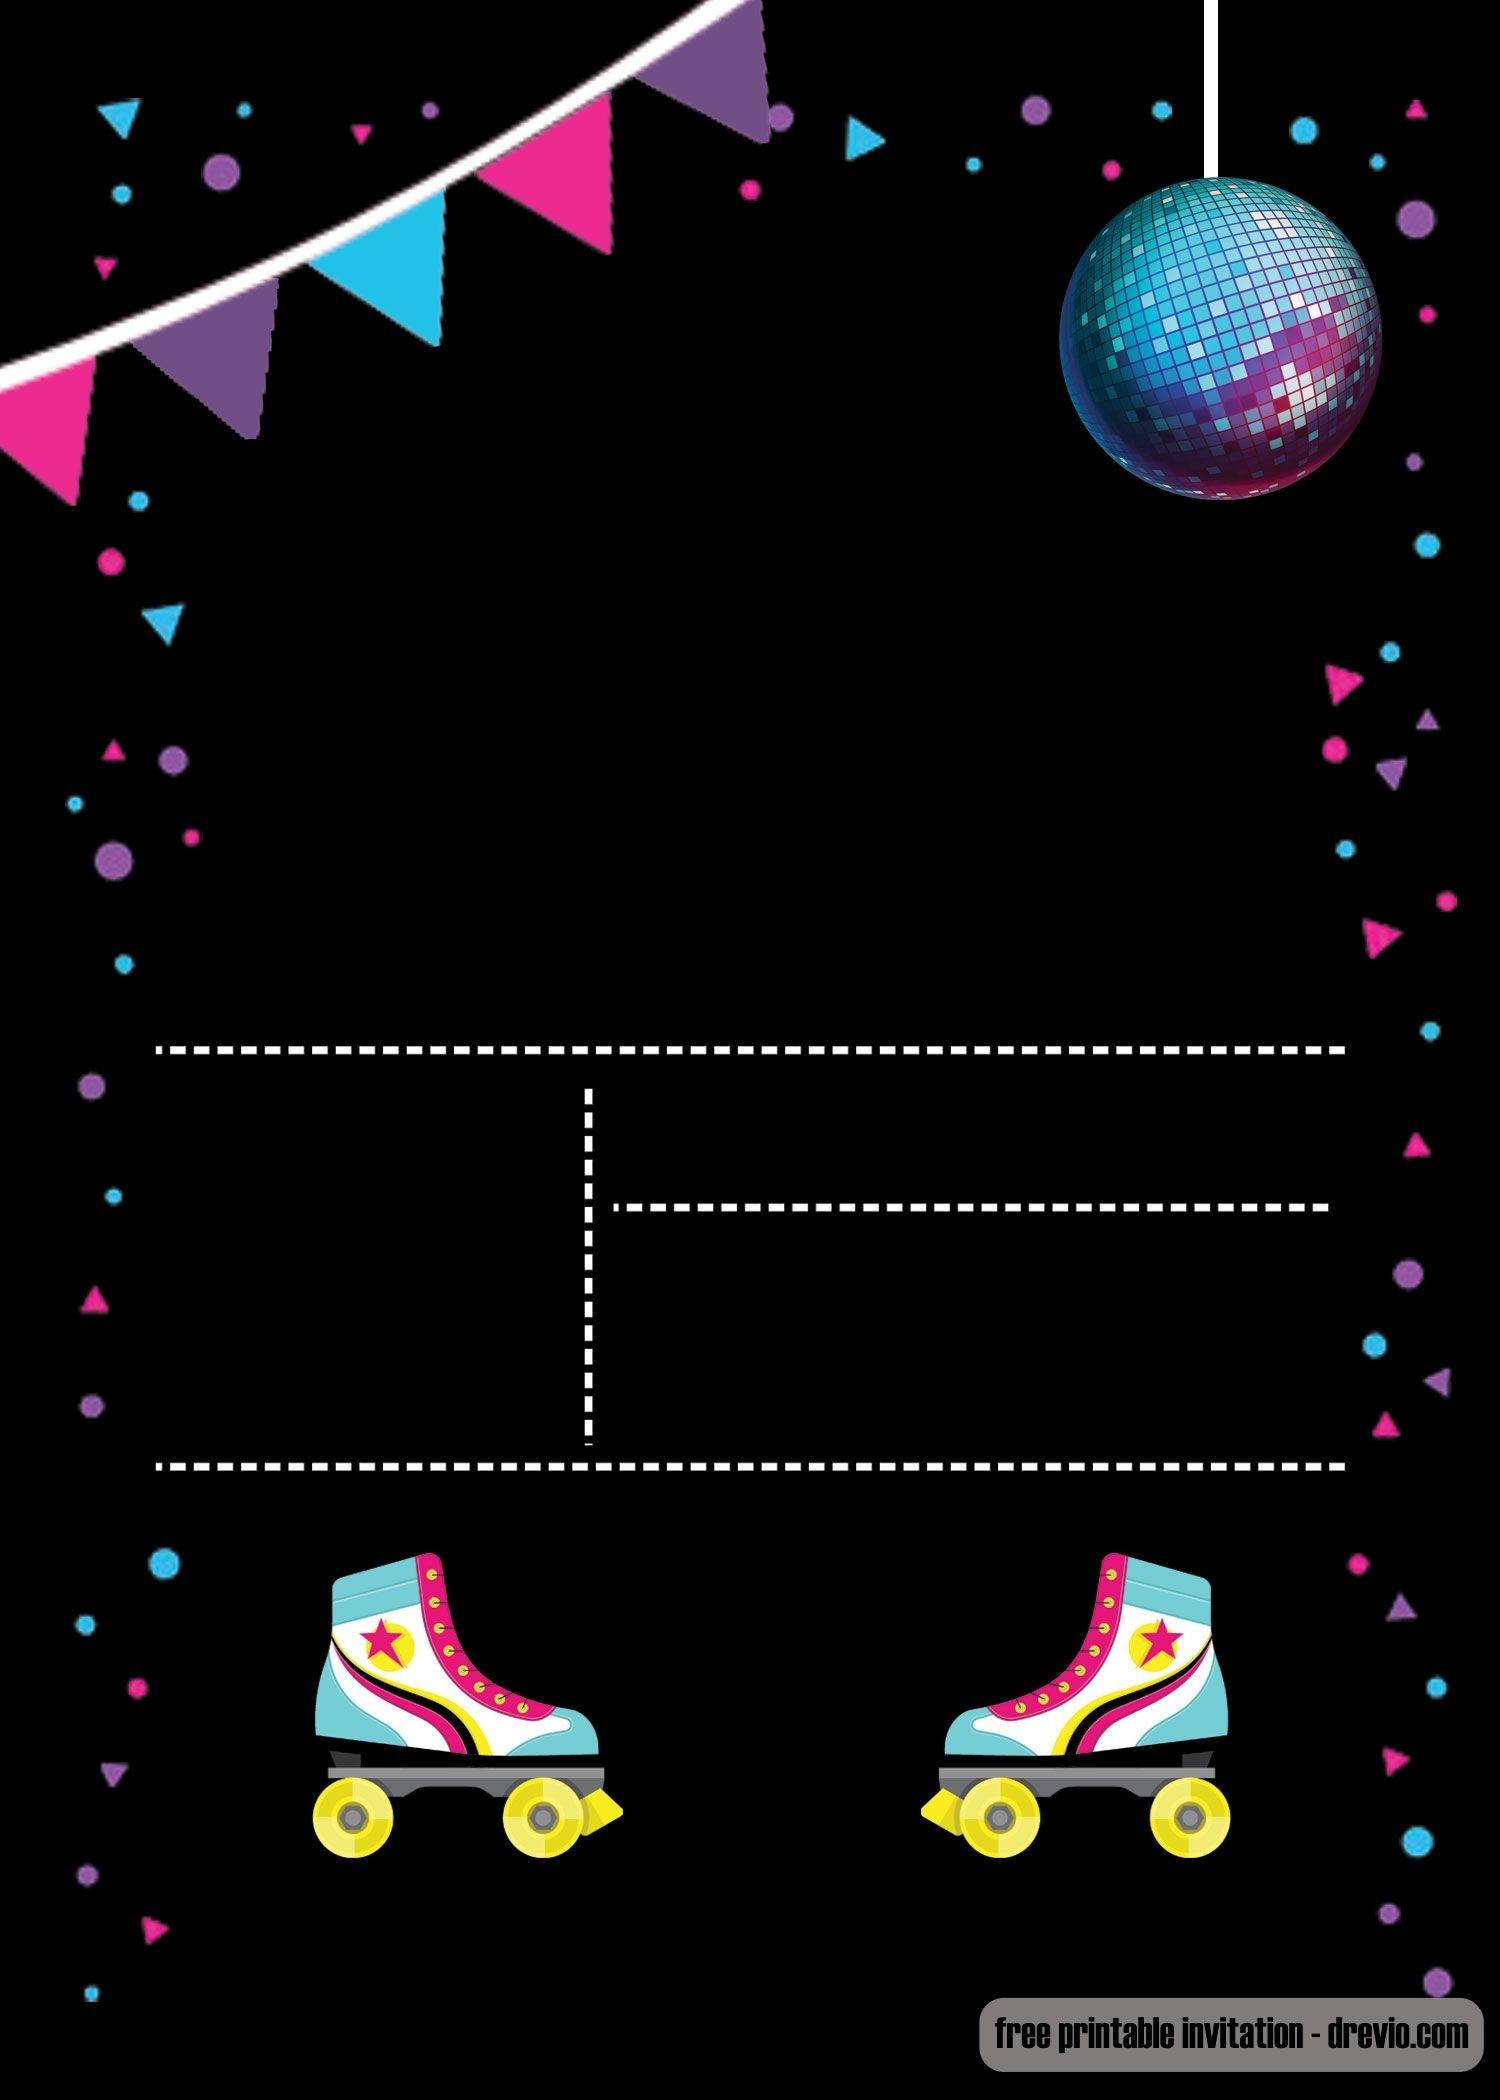 Free Printable Roller Skating Invitation   Invites   Birthday - Free Printable Roller Skate Template